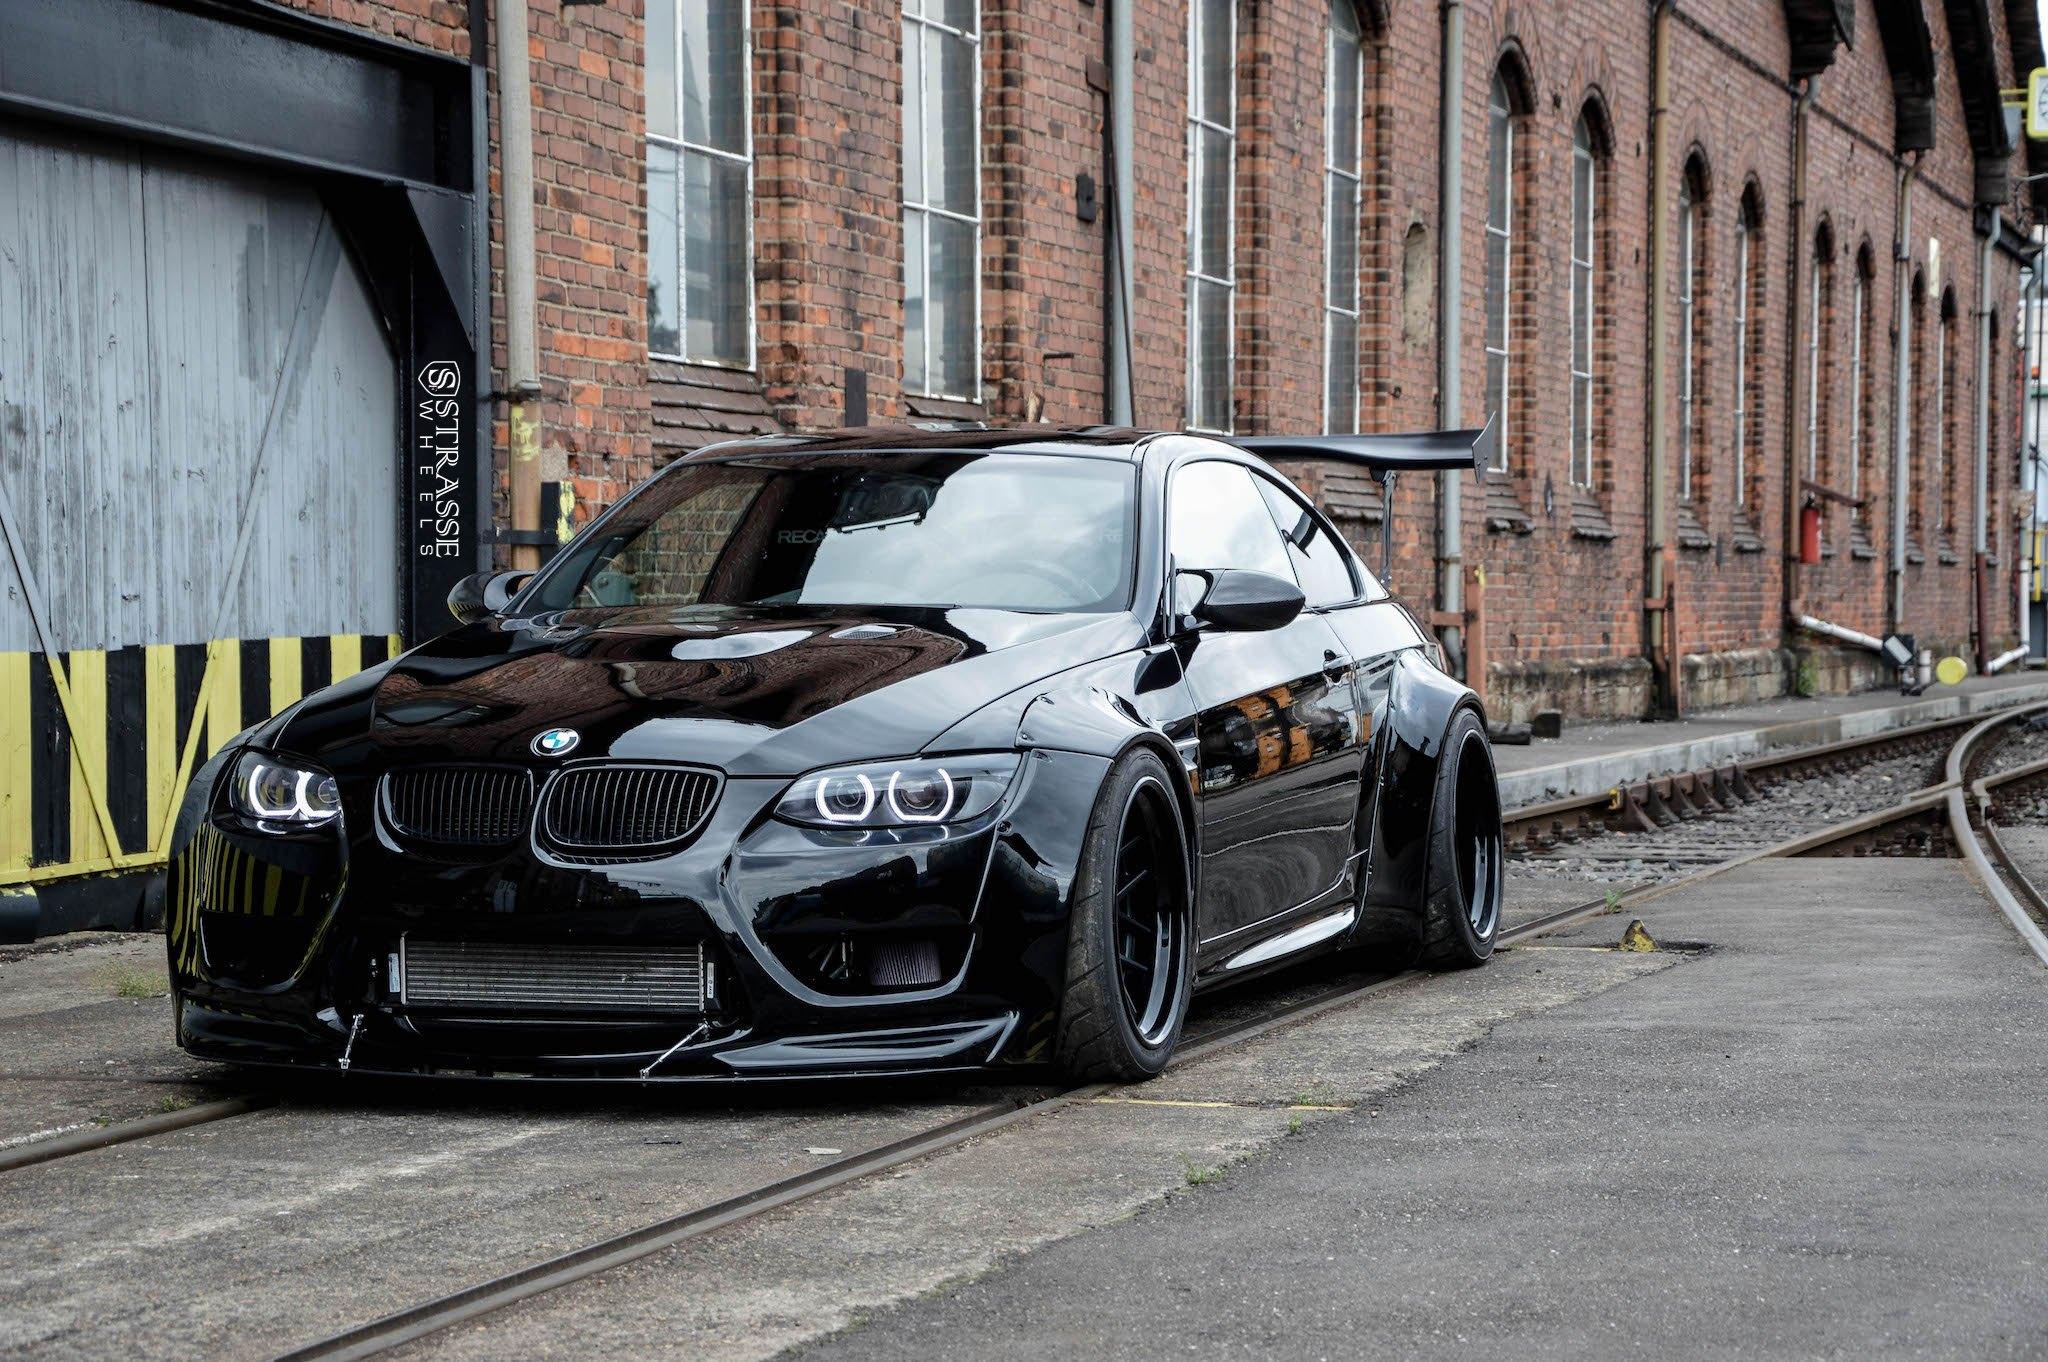 Mean All Black BMW Series Customized In Batman Style CARiD - All black bmw